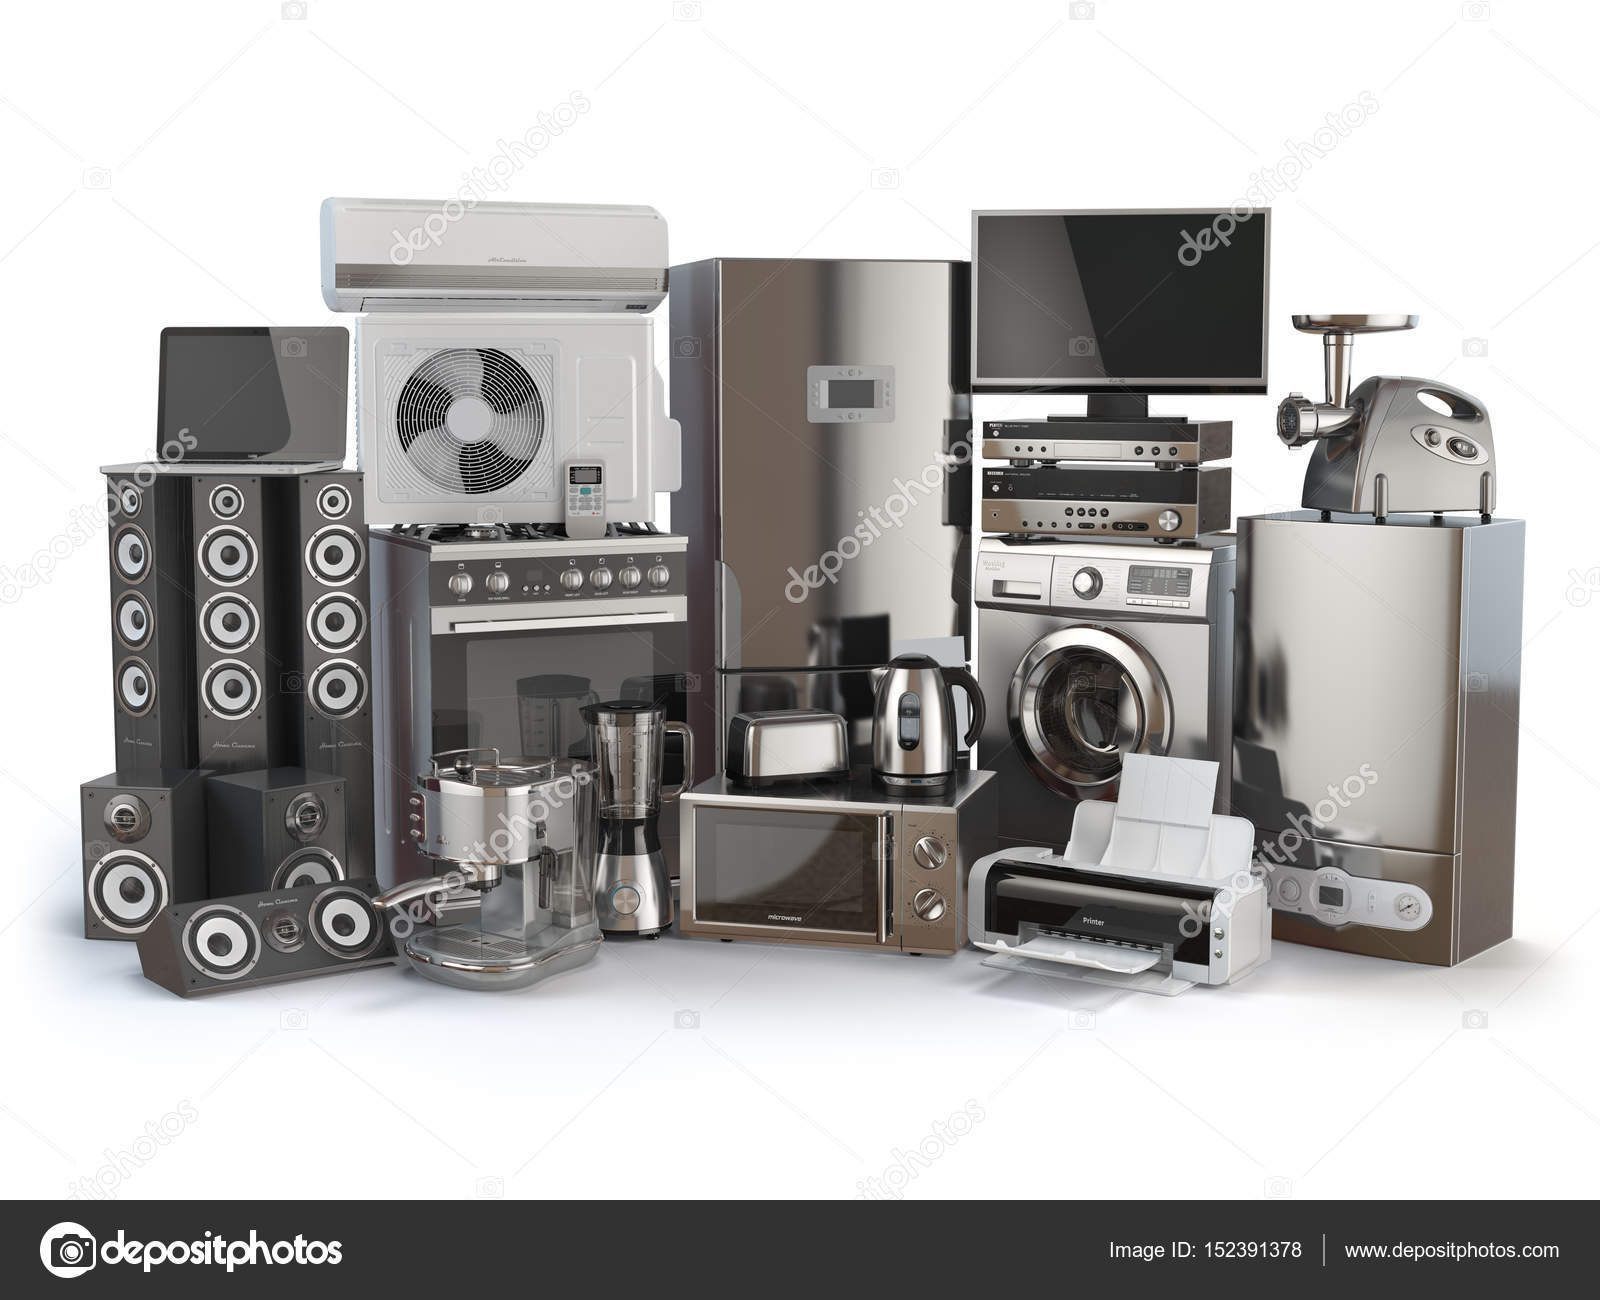 Kühlschrank Gas : Haushaltsgeräte gas herd tv kino kühlschrank luft bedin